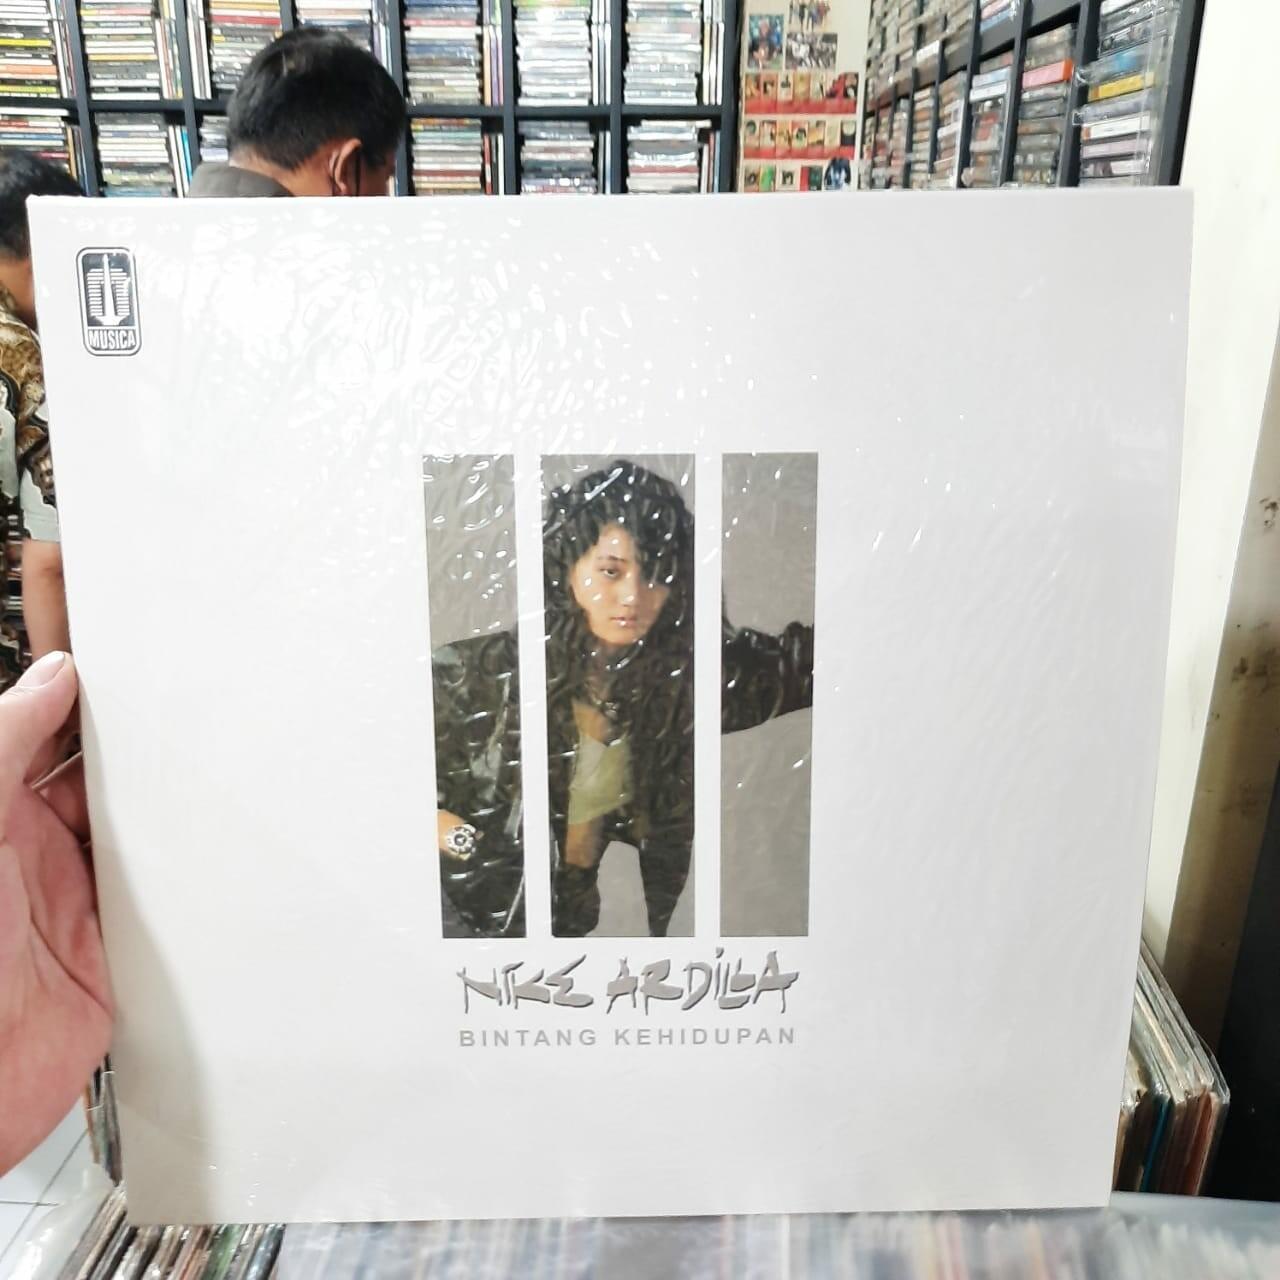 [PRE ORDER] NIKE ARDILLA -BINTANG KEHIDUPAN- LP